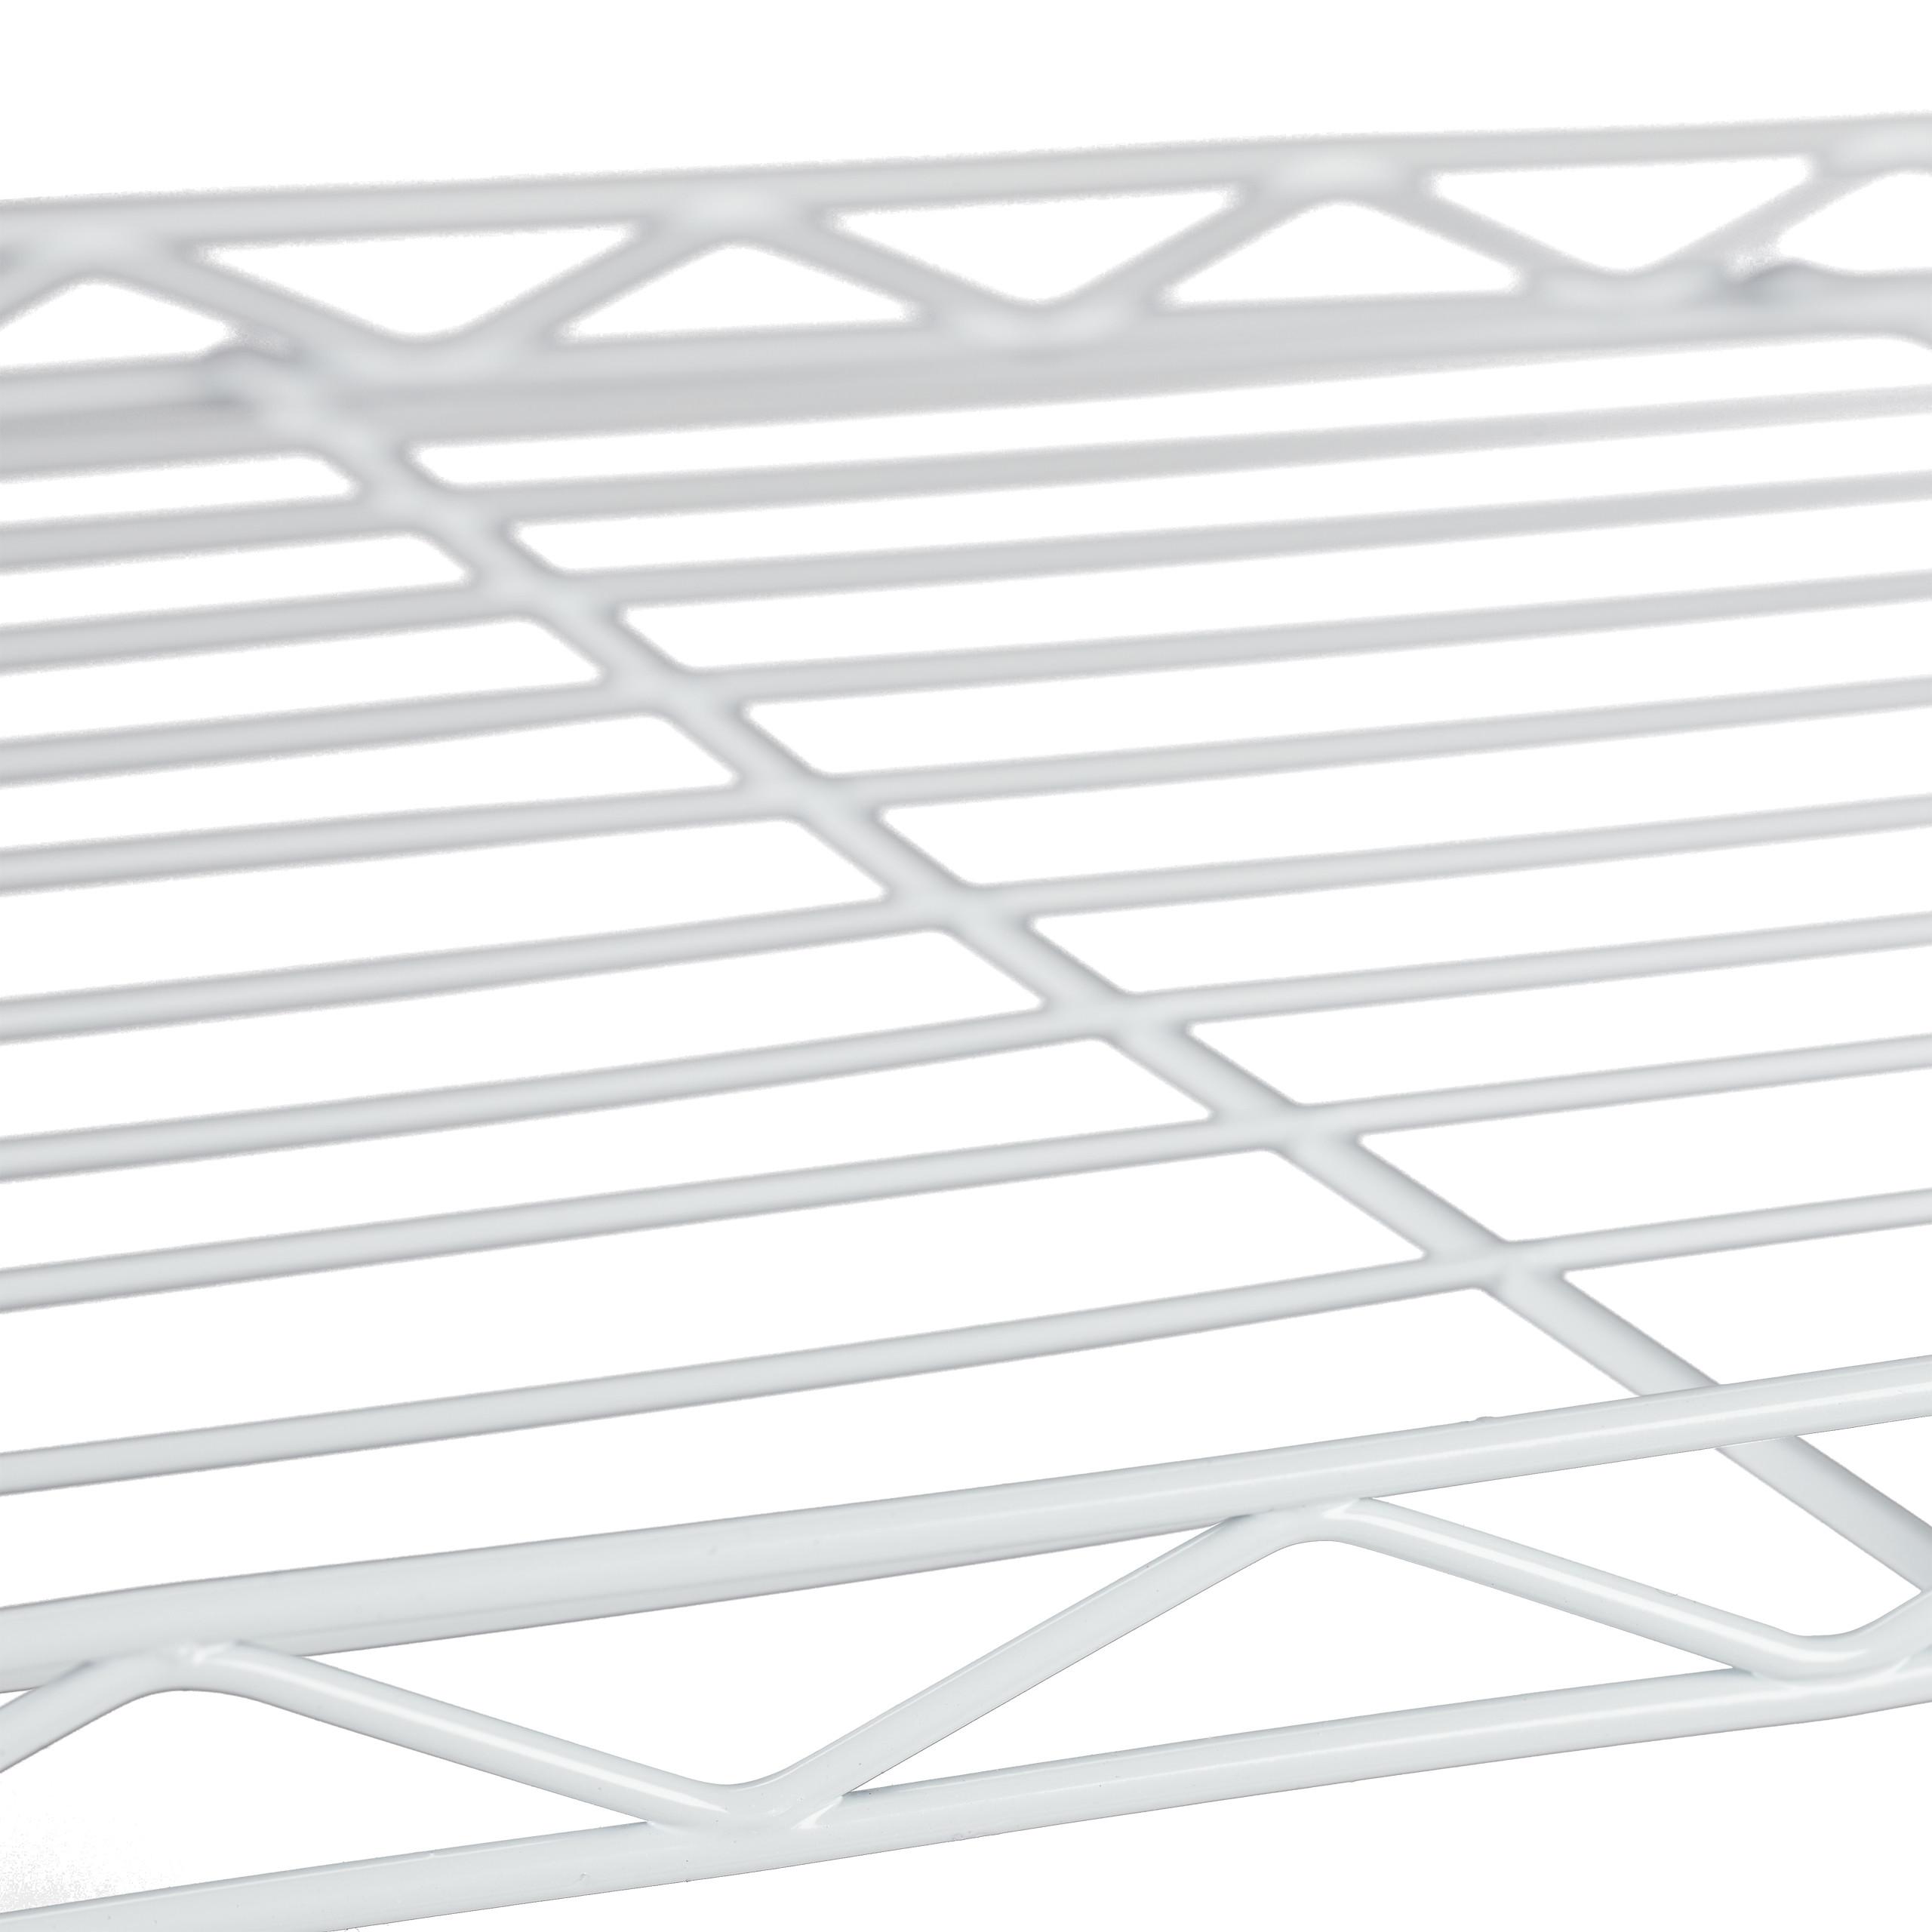 Regal-Metall-Kuechenregal-Metallregal-Kueche-Standregal-Schuhregal-Vorratsregal Indexbild 7